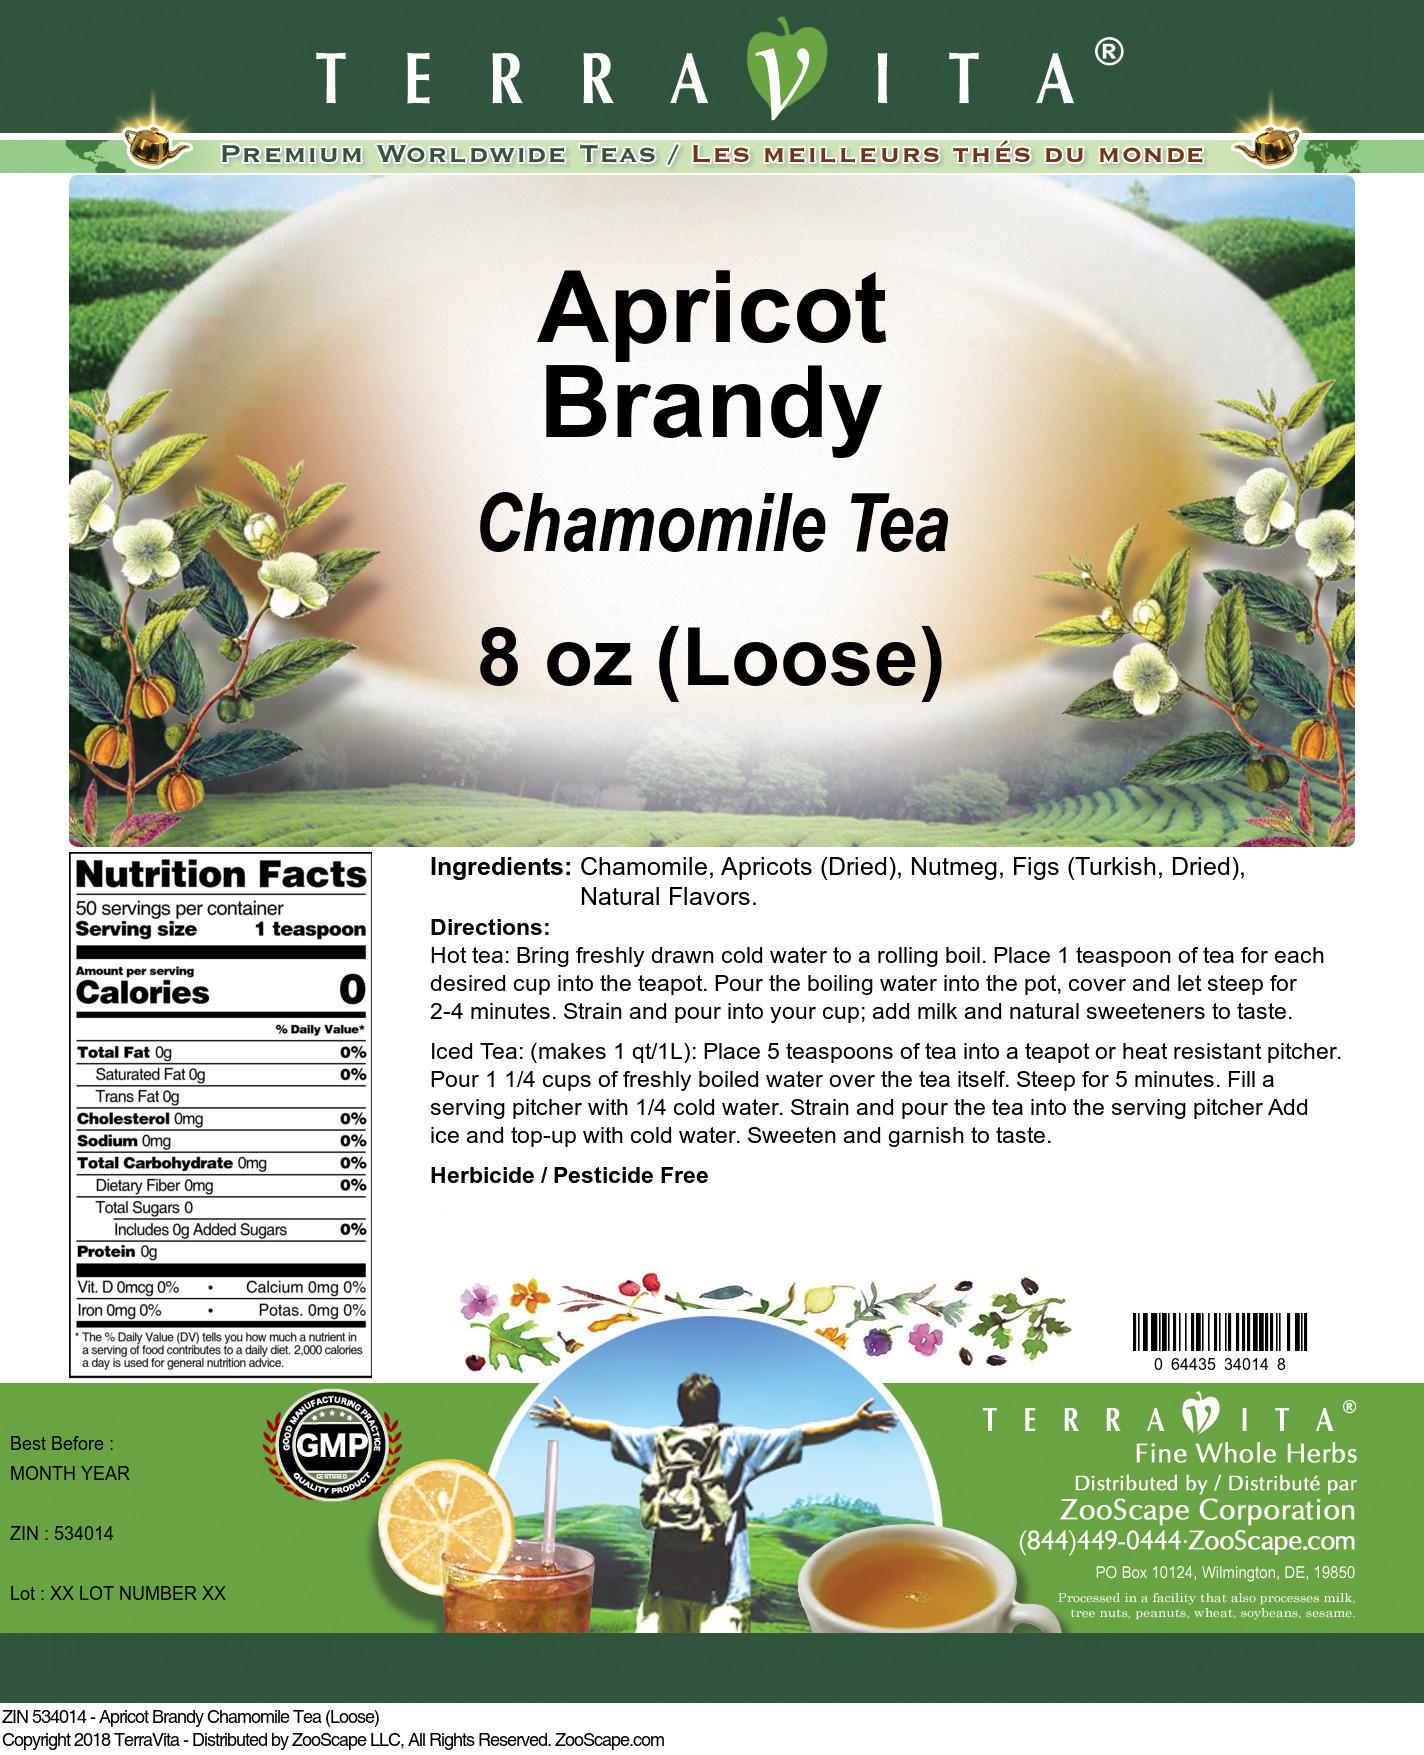 Apricot Brandy Chamomile Tea